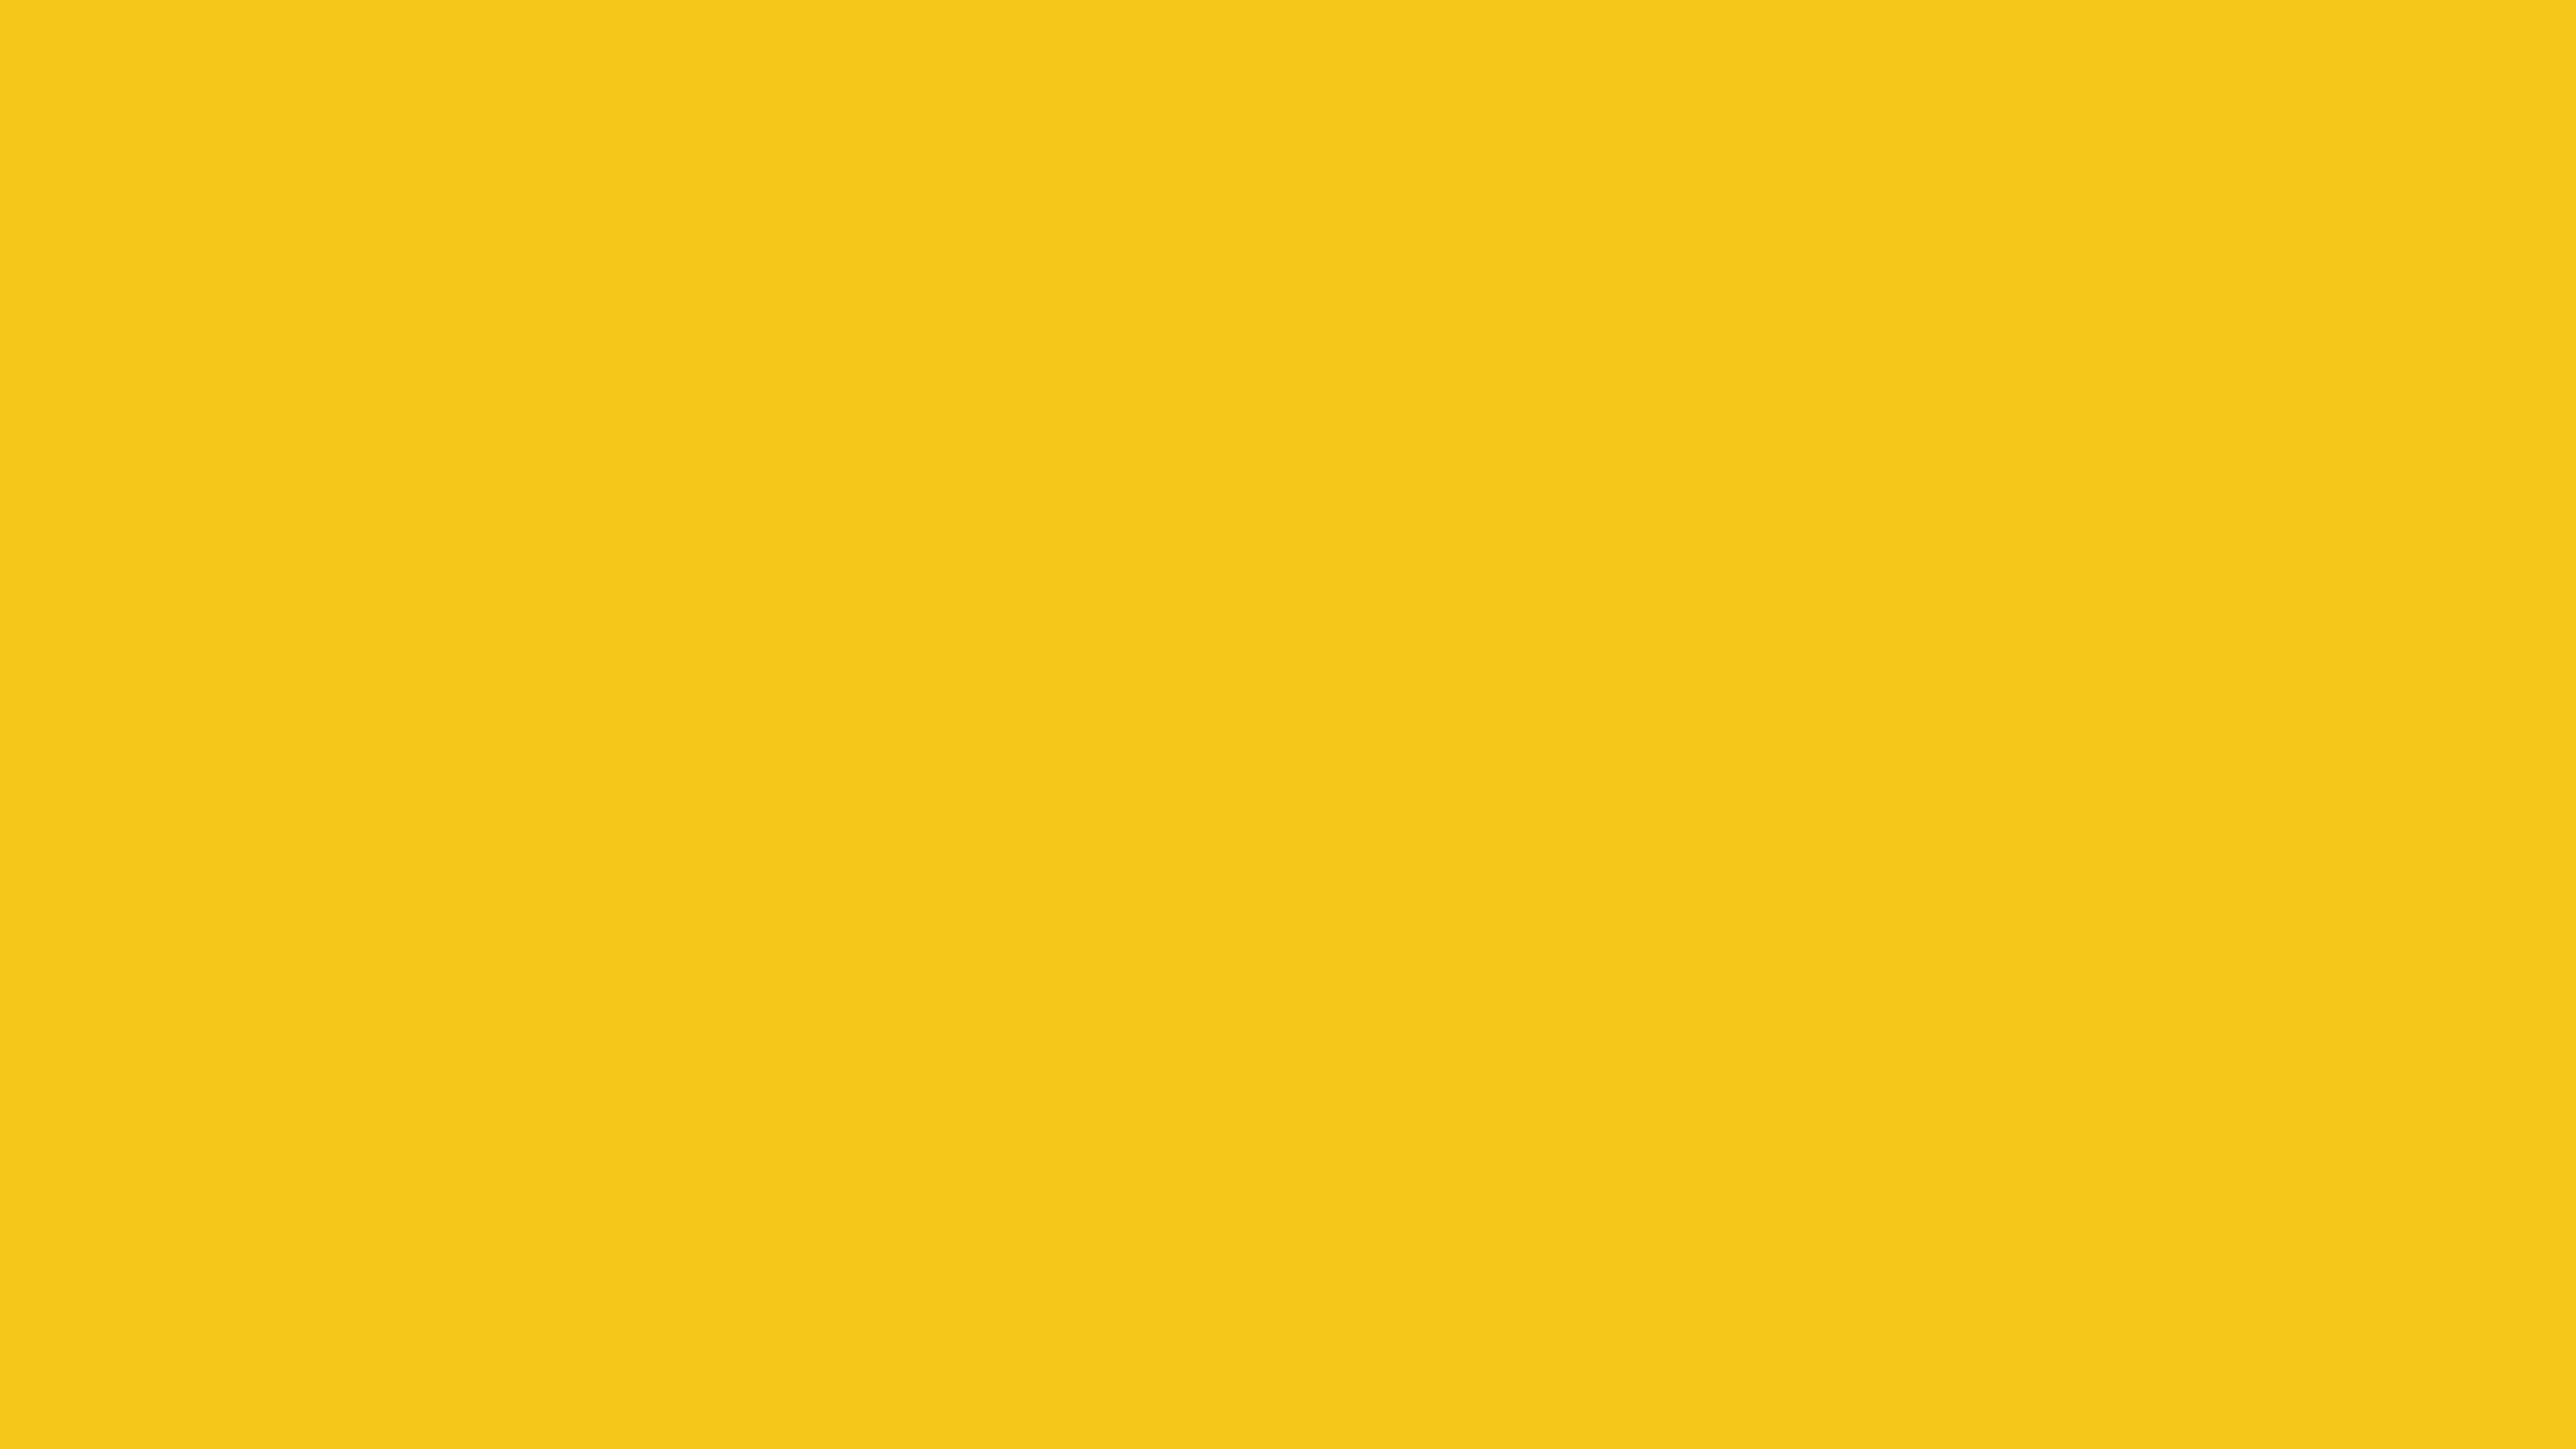 3840x2160 Deep Lemon Solid Color Background